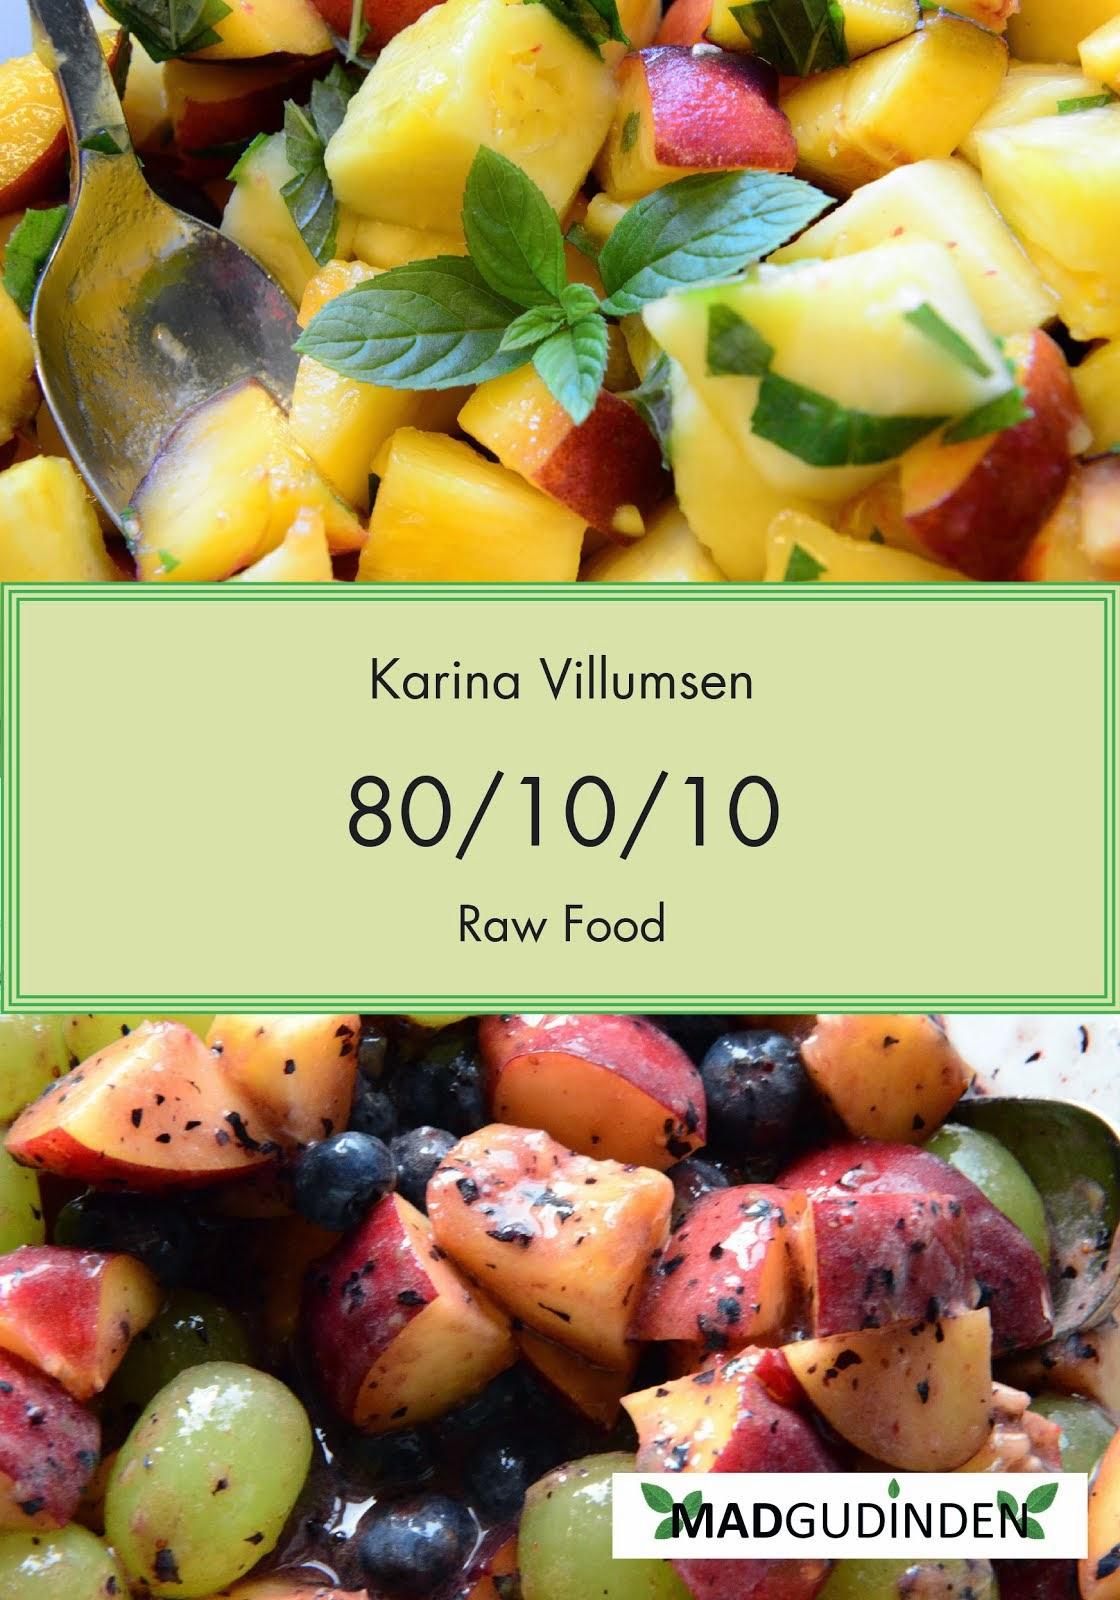 80/10/10 - Raw food